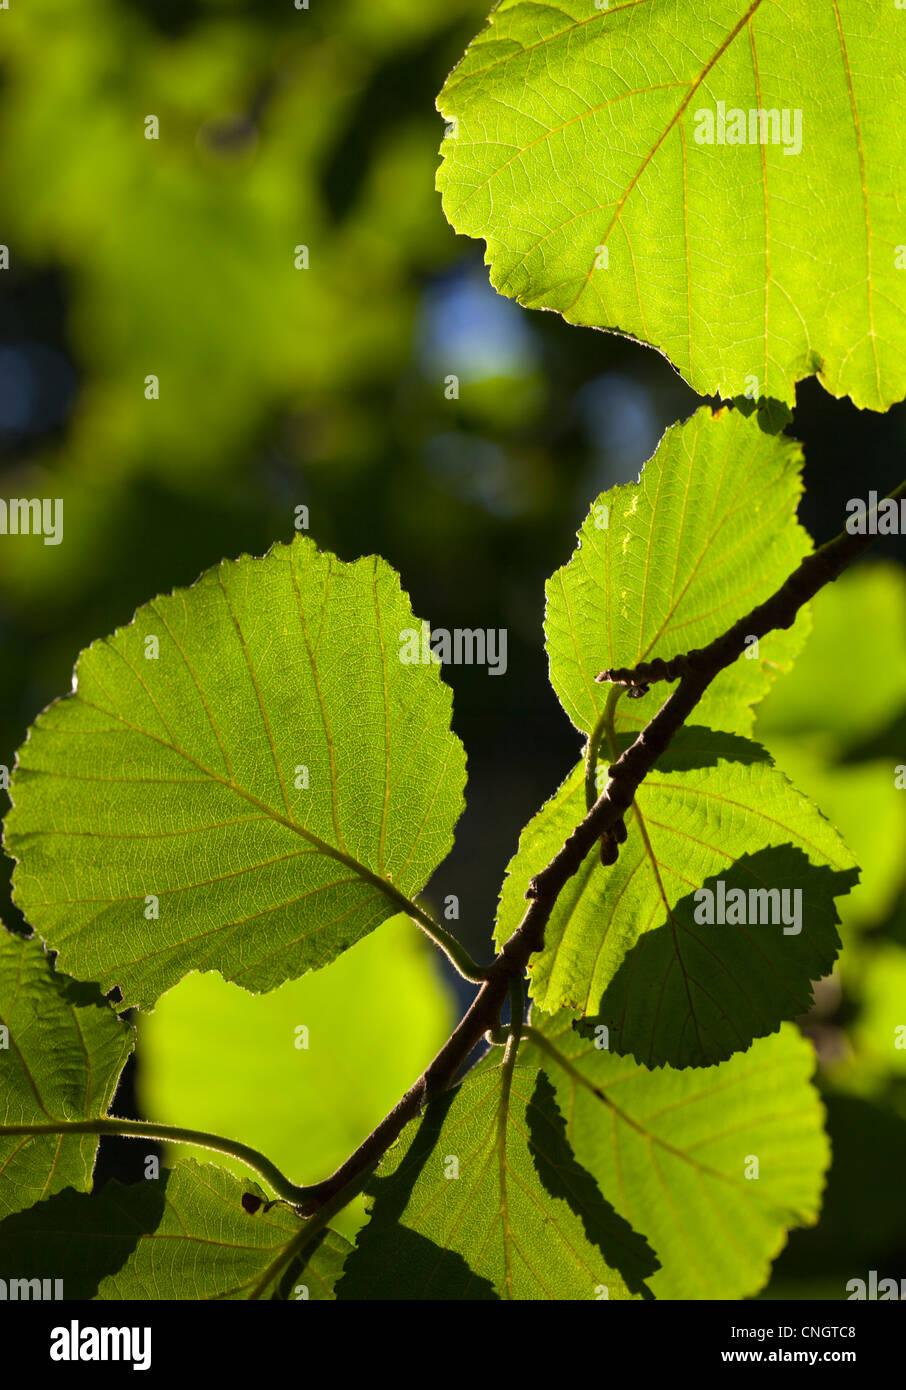 Manchurian alder Alnus Hirsuta , Betulaceae tree leaves - Stock Image